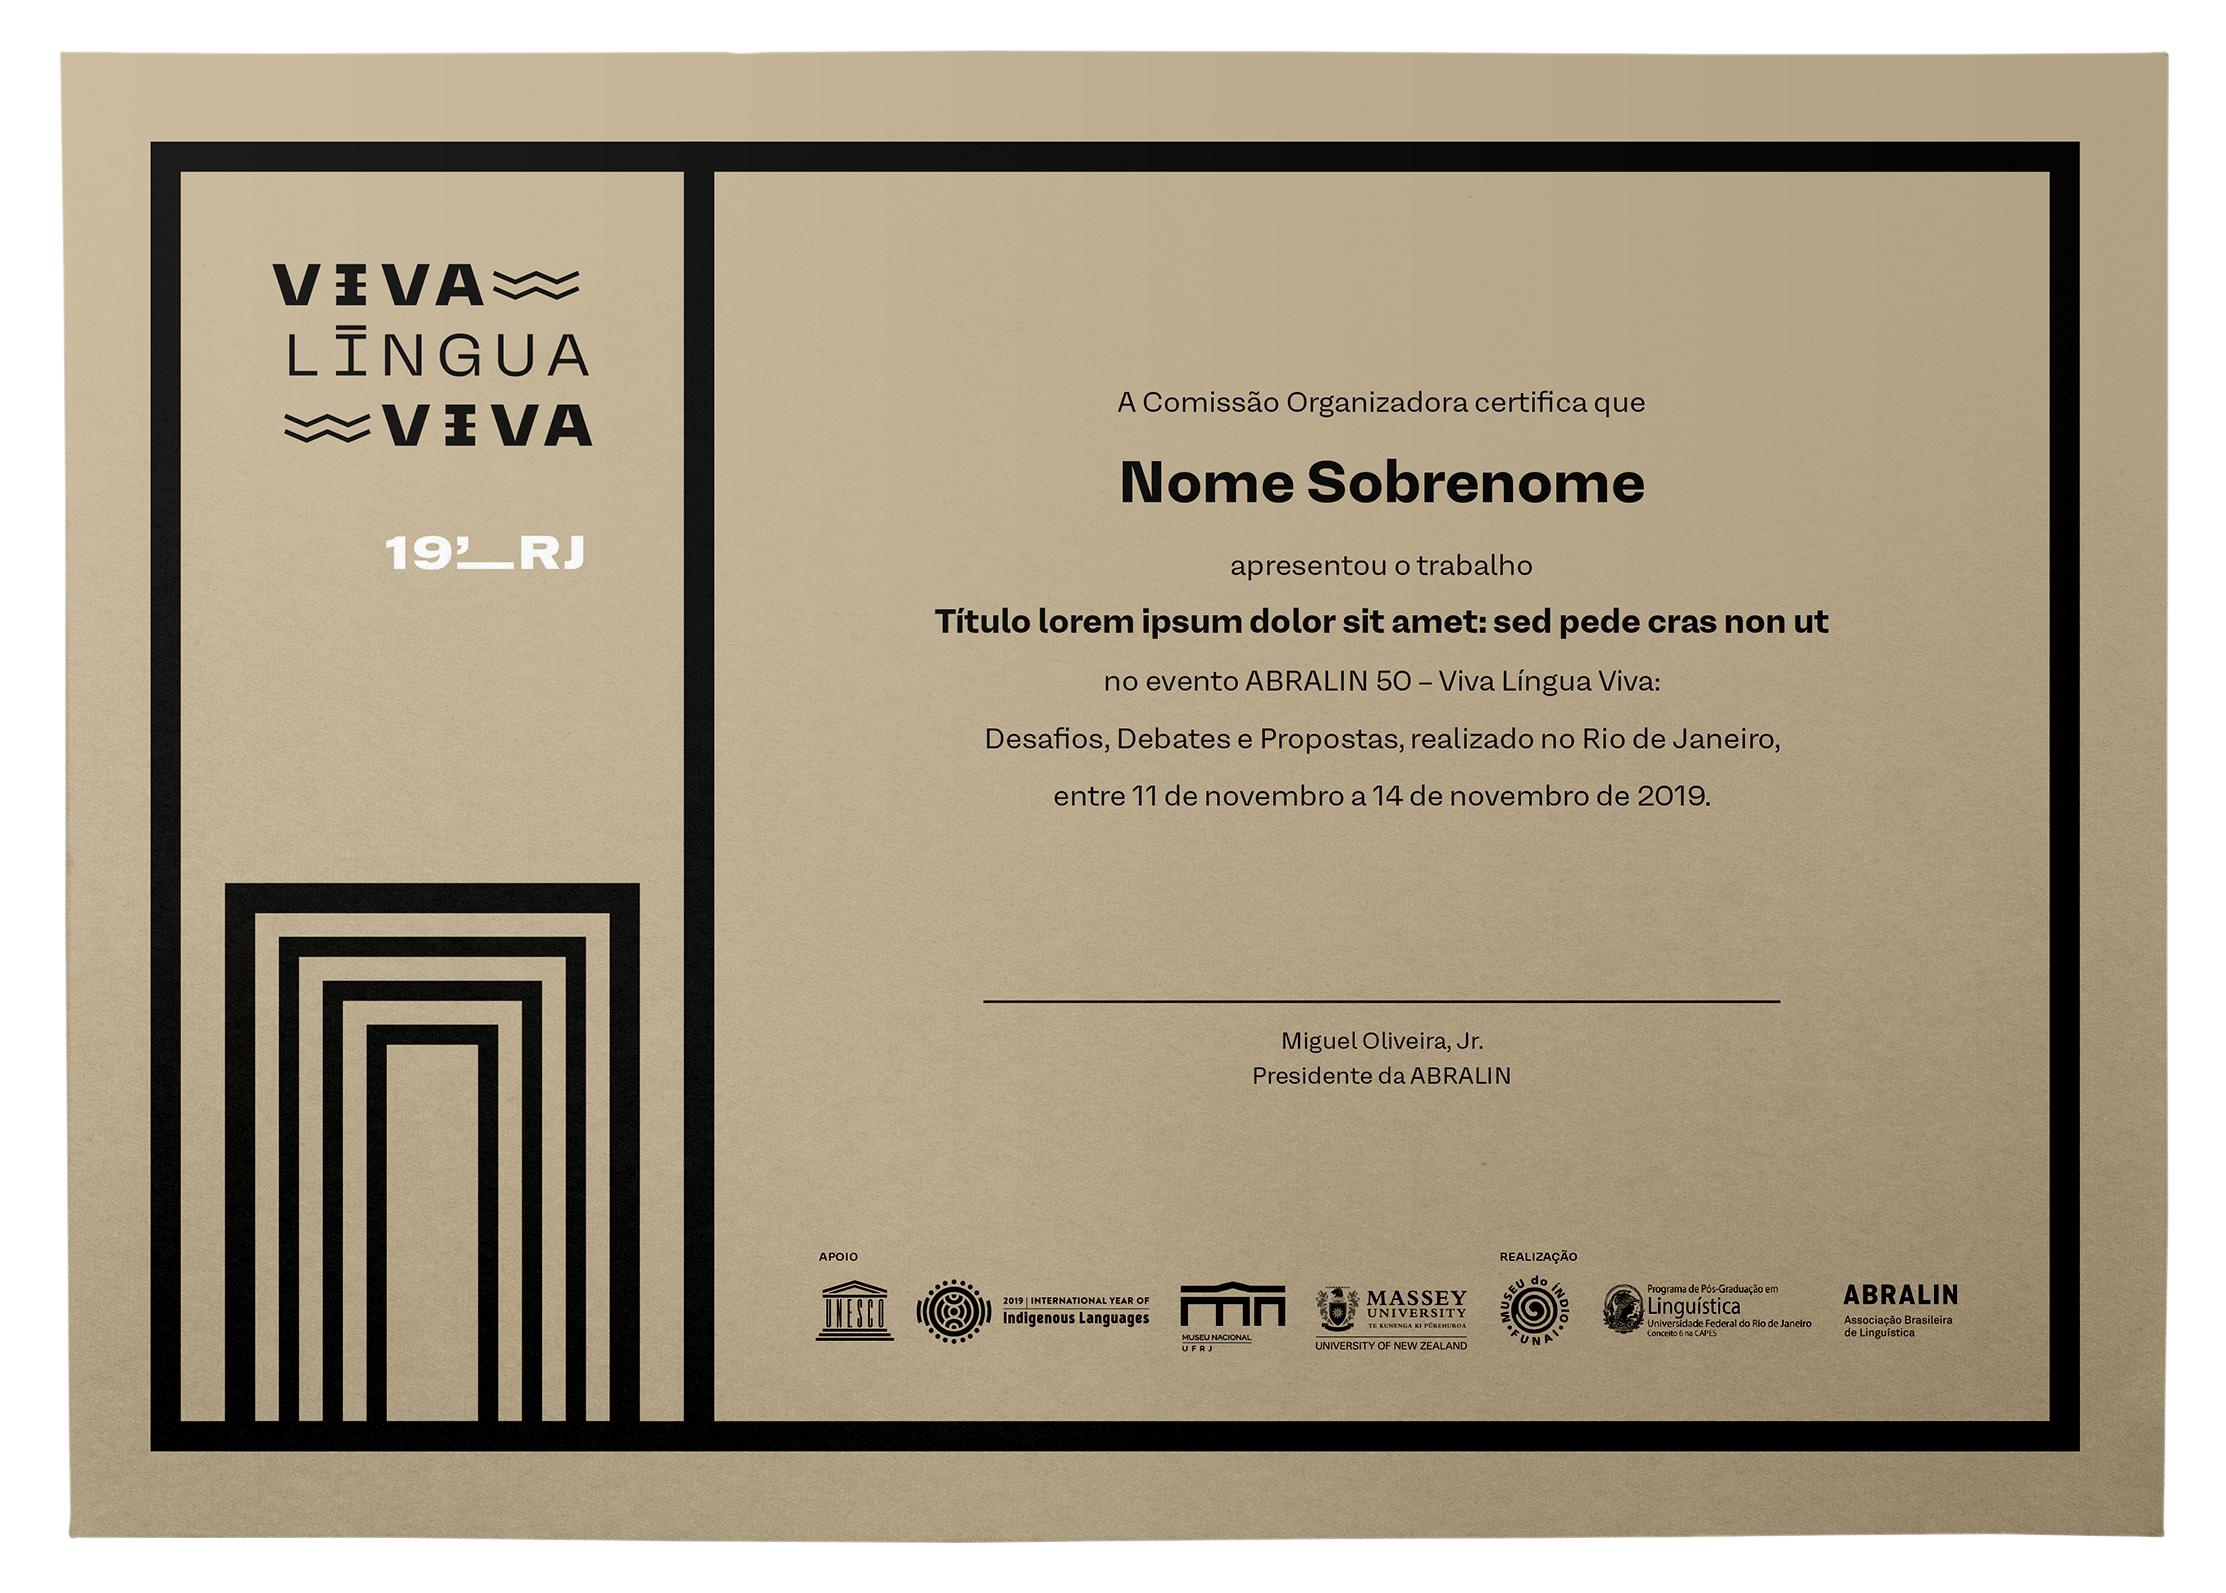 vlv-certificado